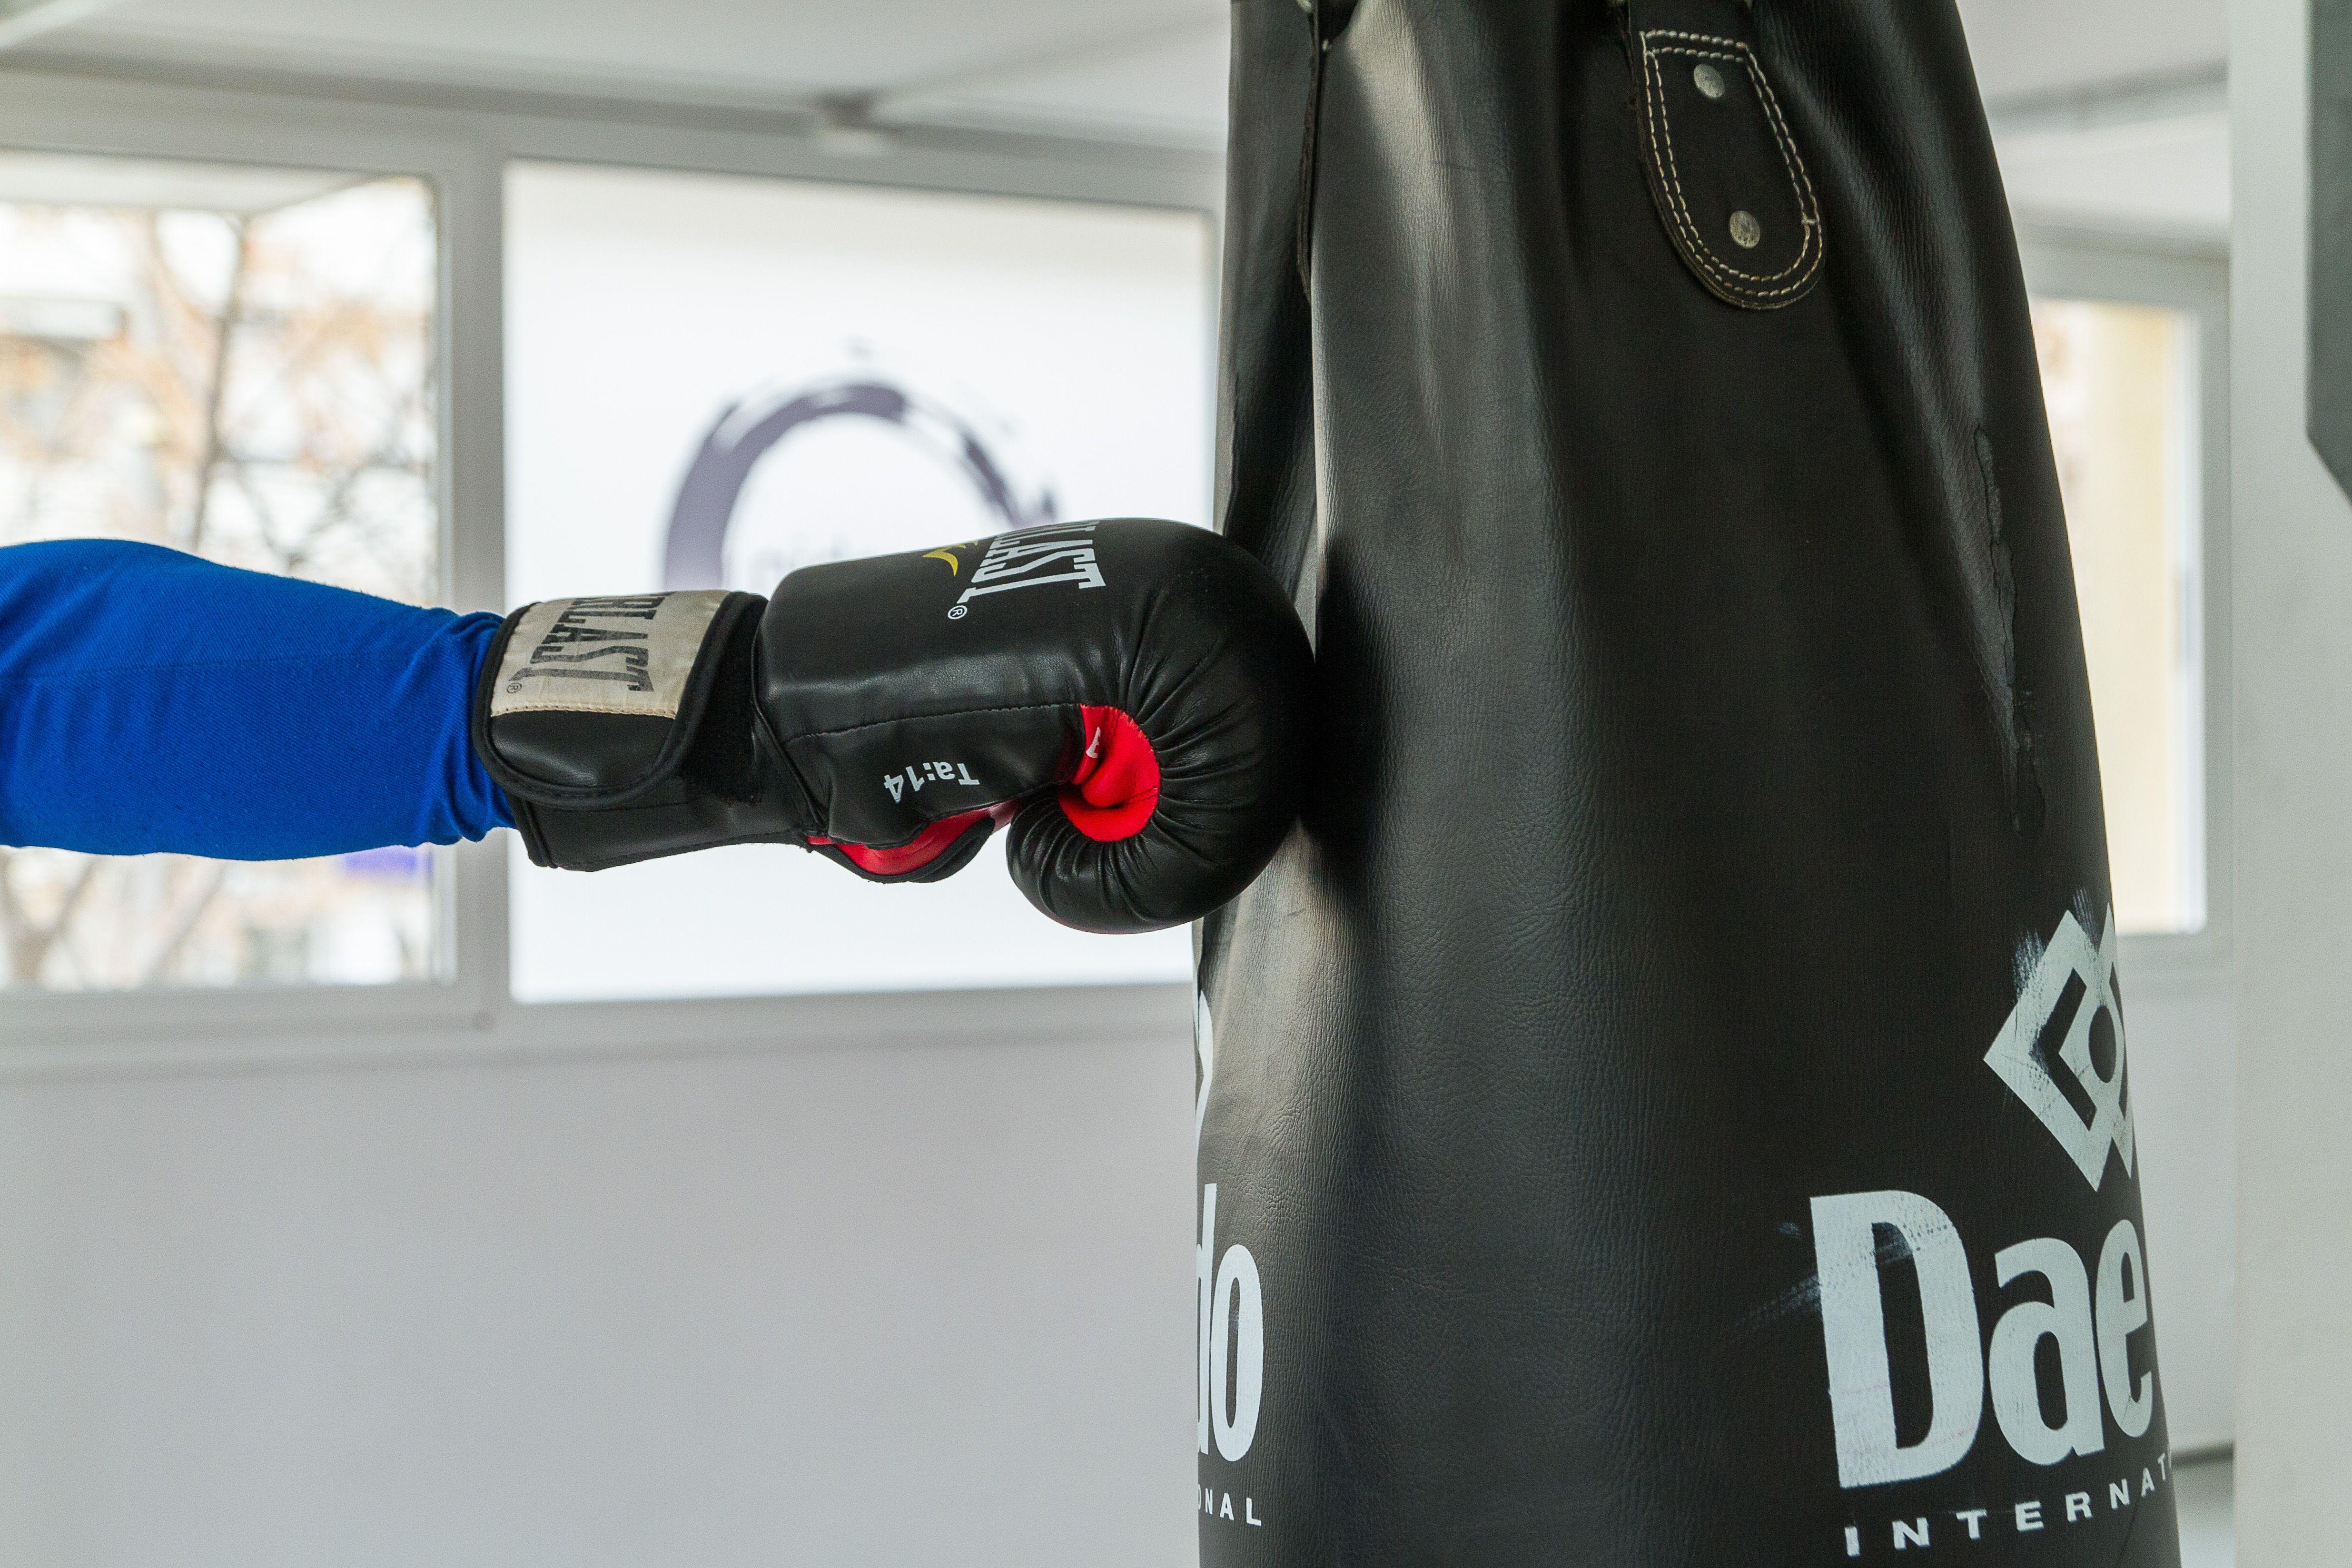 Clases de diferentes disciplinas de combate: taekwondo, lucha libre, judo, kárate, boxeo, Kenpo...